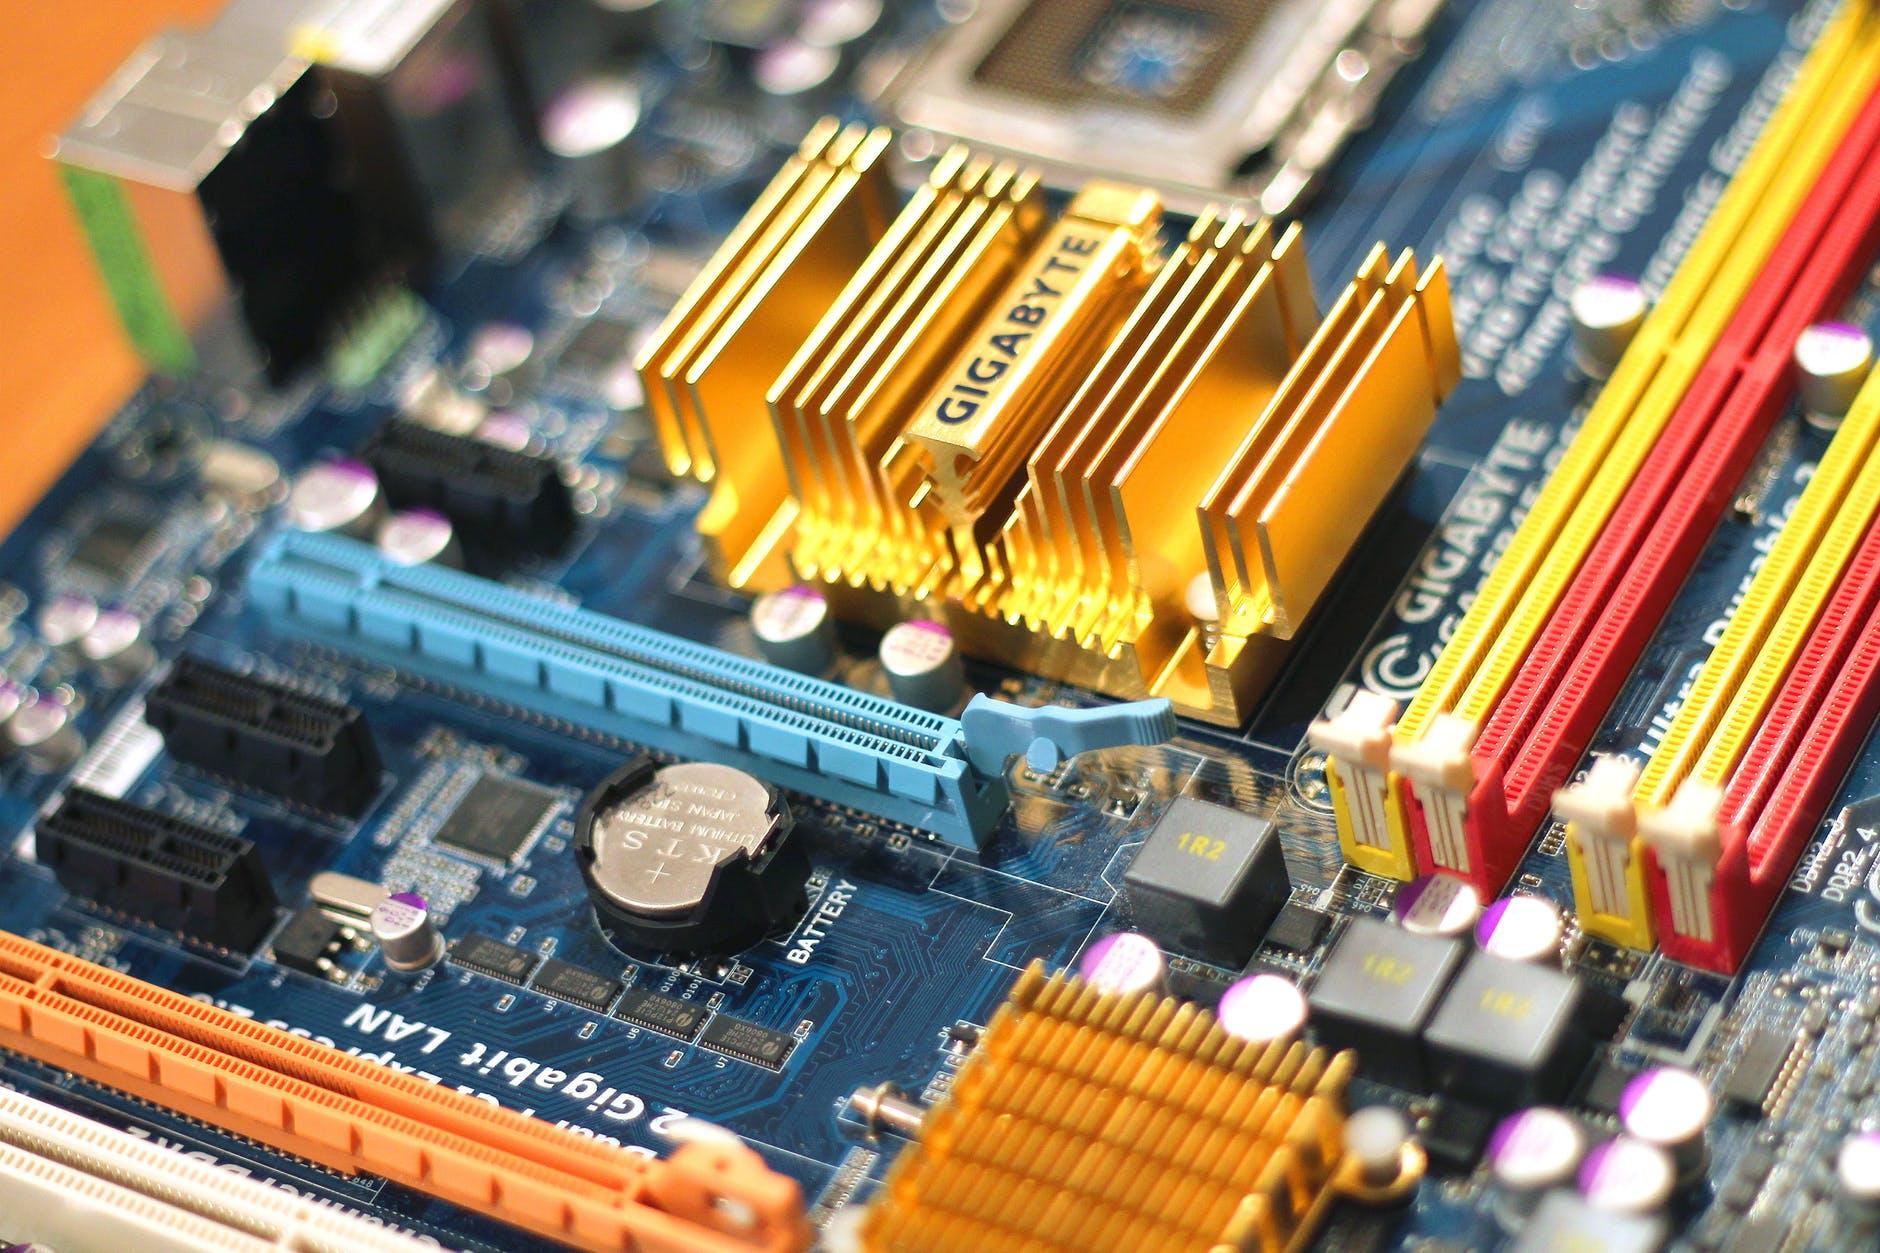 circuit network